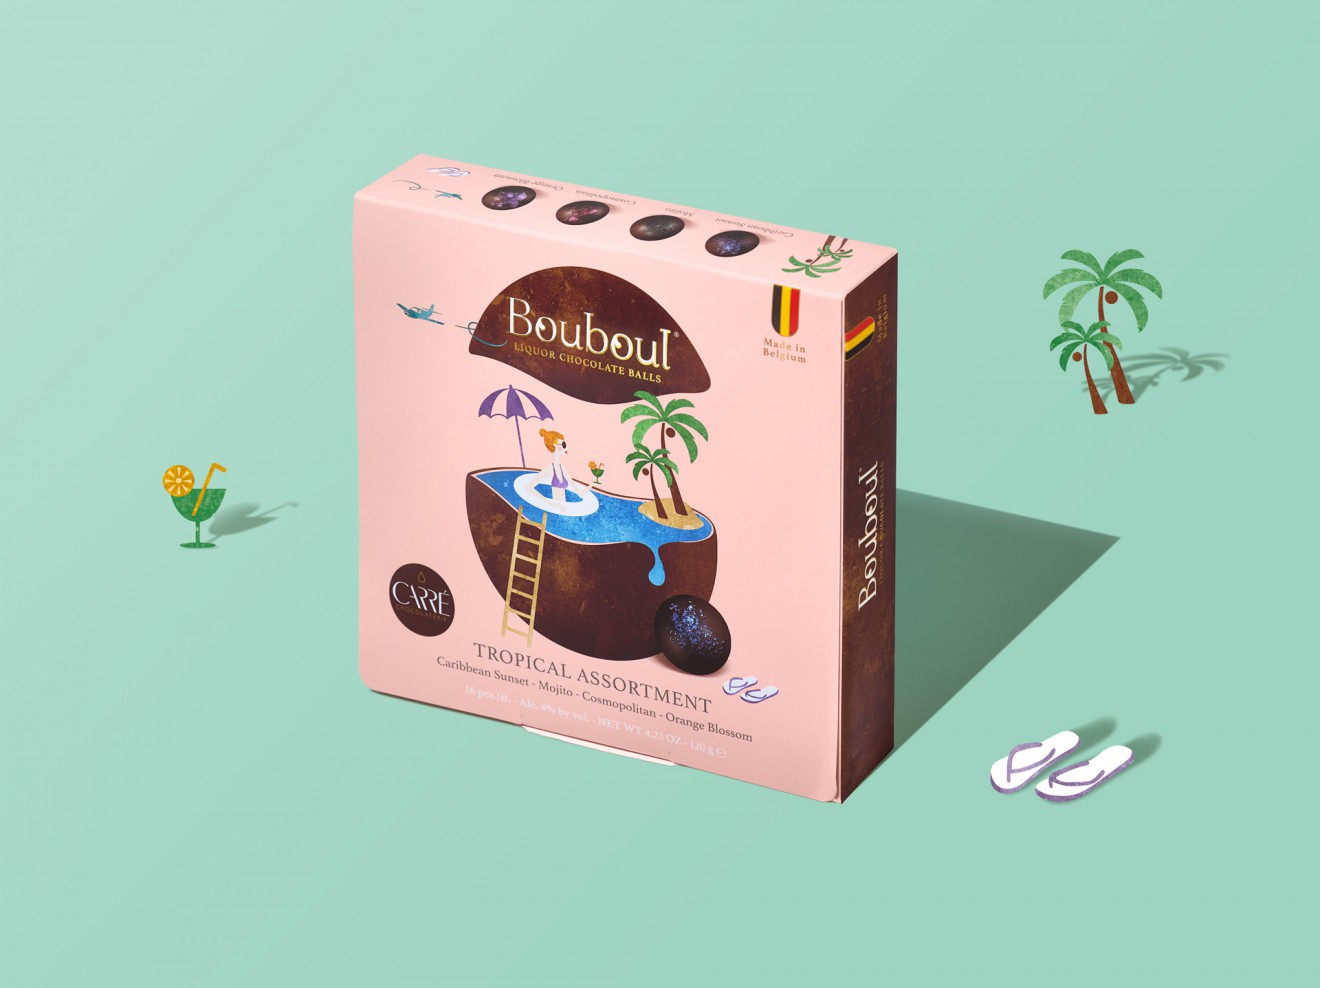 Quatre Mains package design - quatre mains, tropical assortment, cocktails